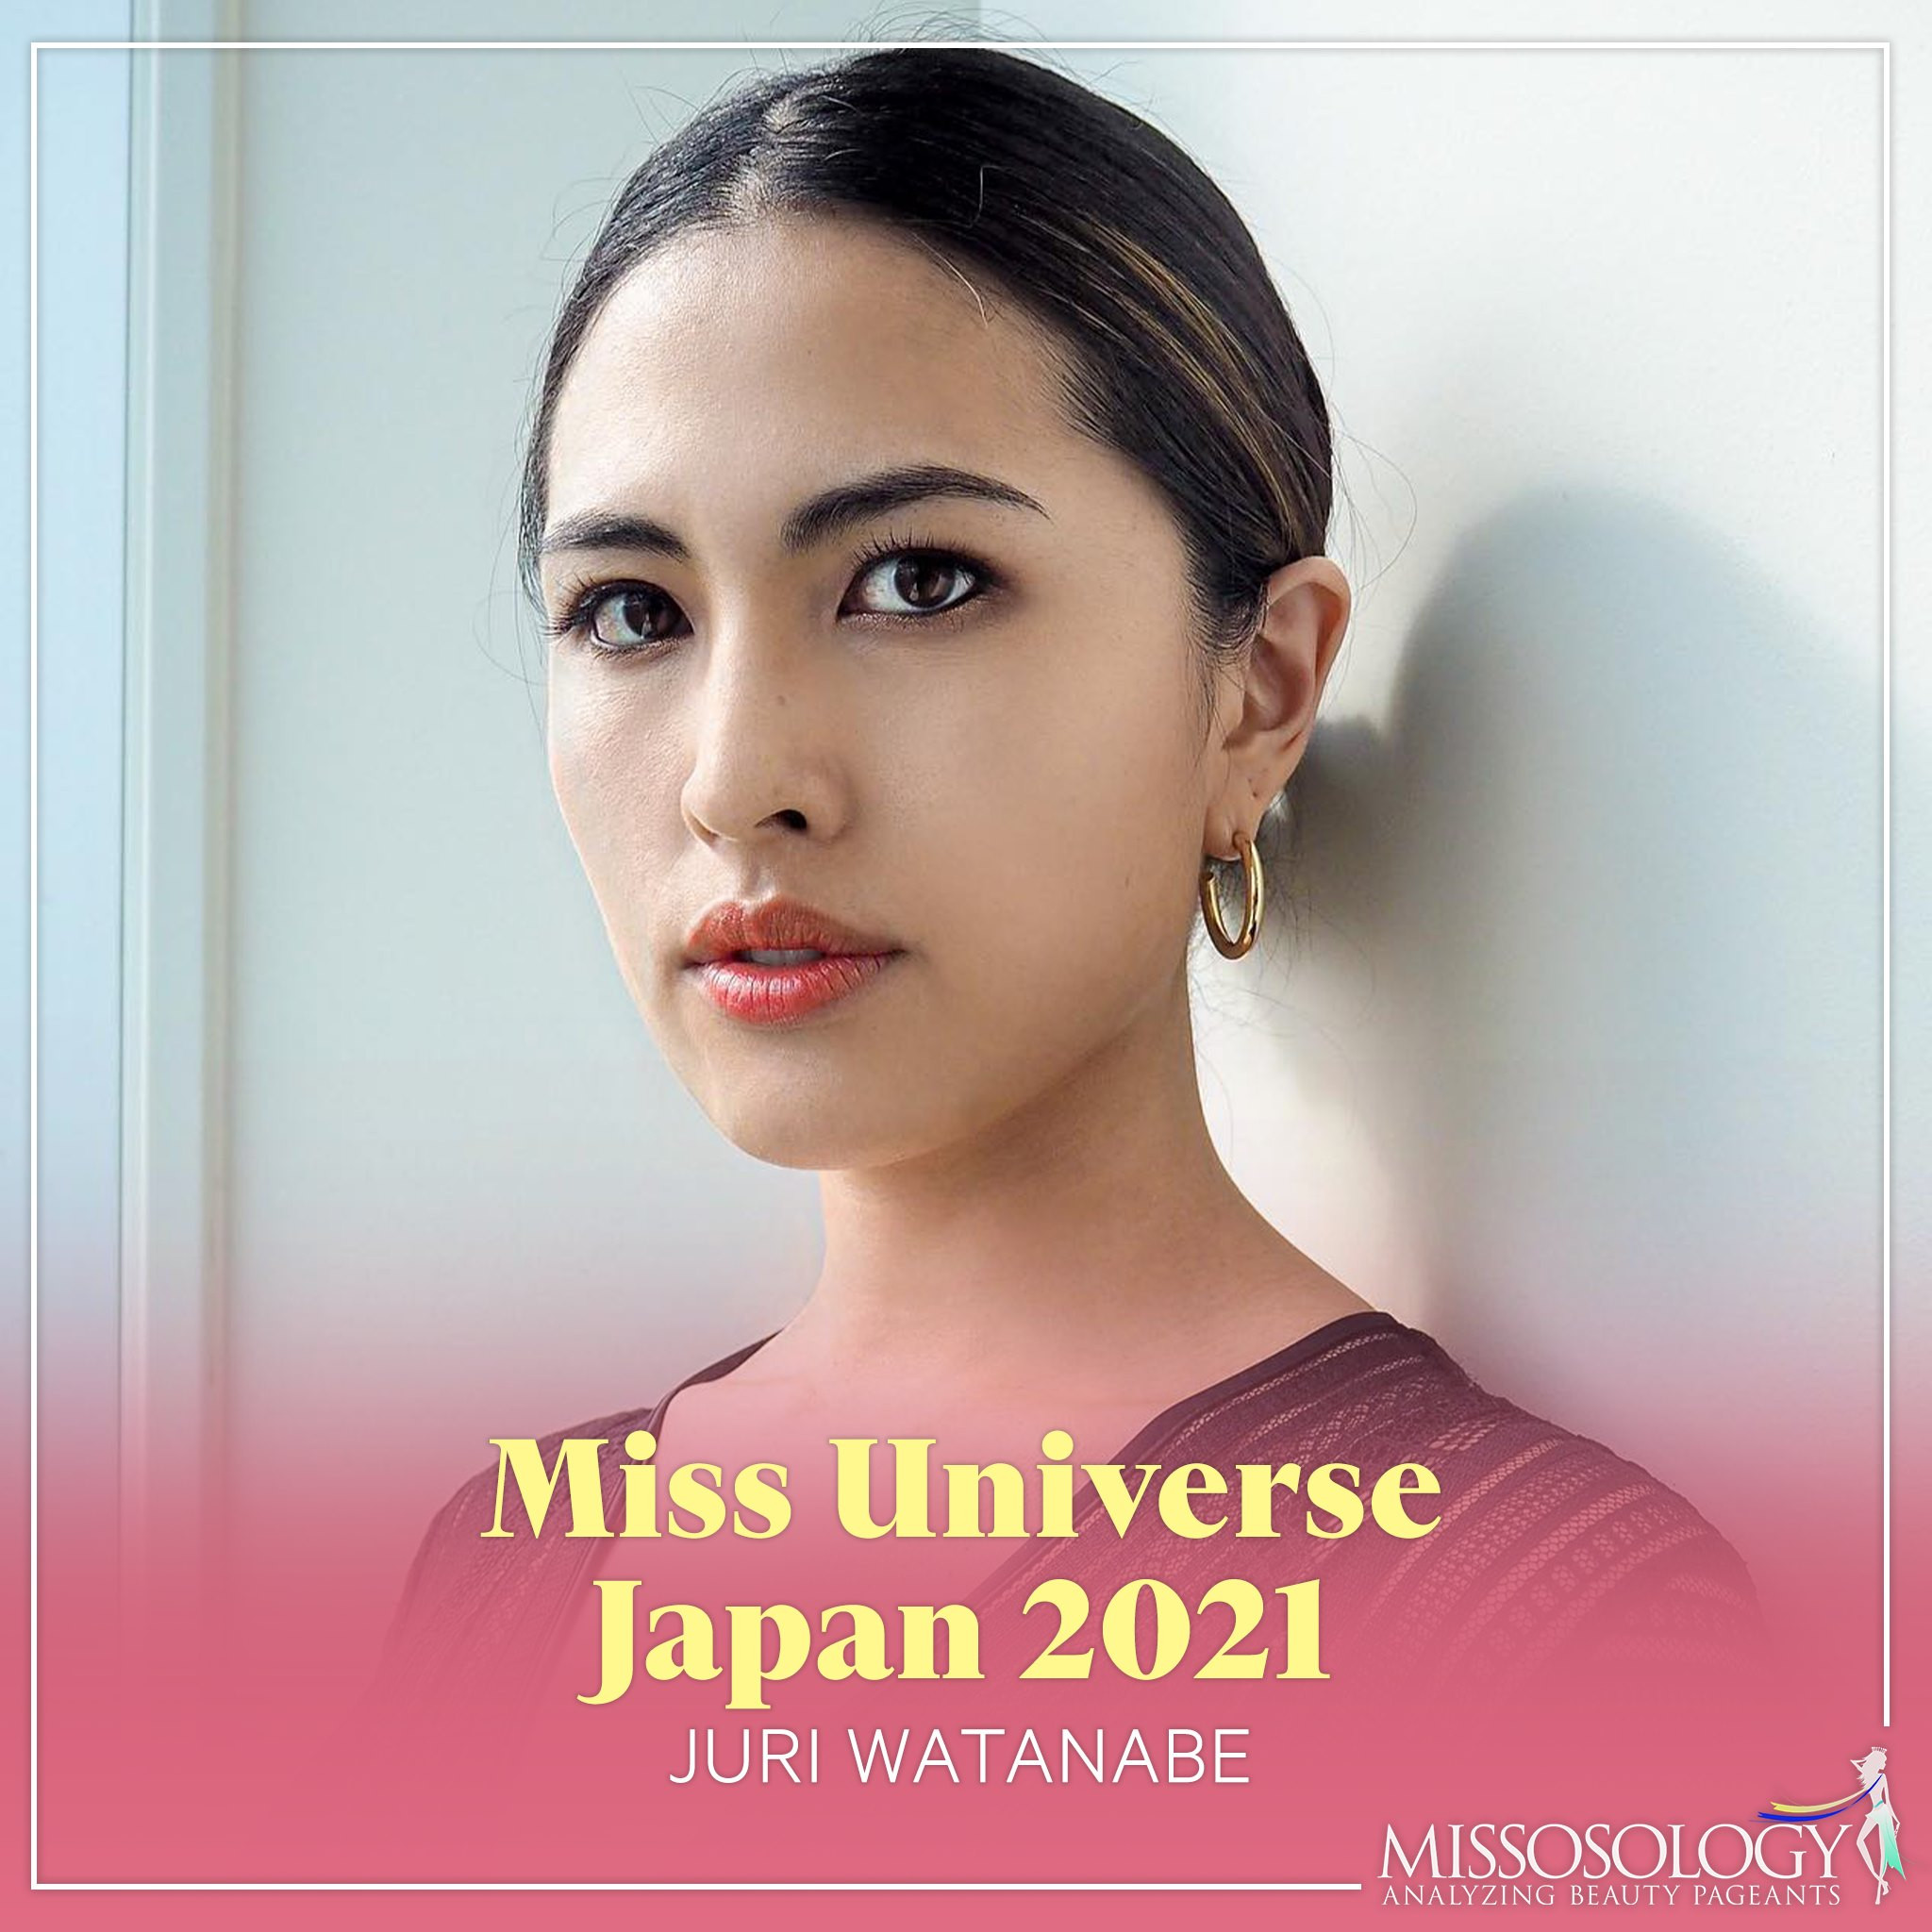 juri watanabe vence miss universe japan 2021.  - Página 3 RLTp3l